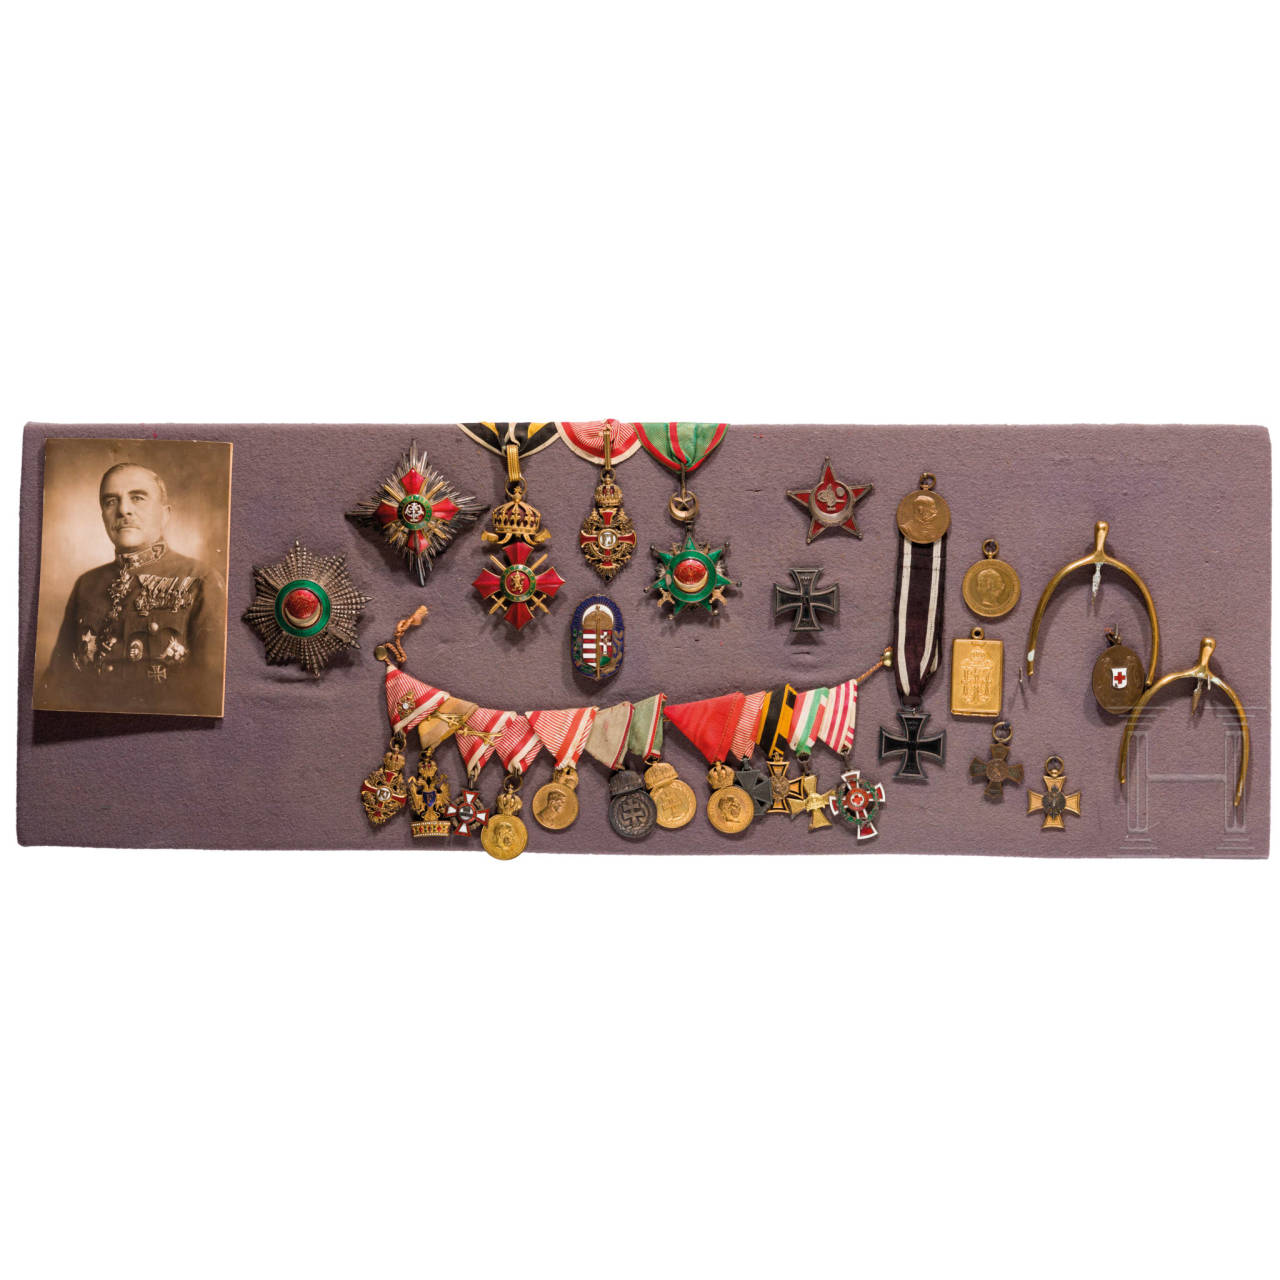 Awards and paintings belonging to Lieutenant Field Marshal Sándor Kontz